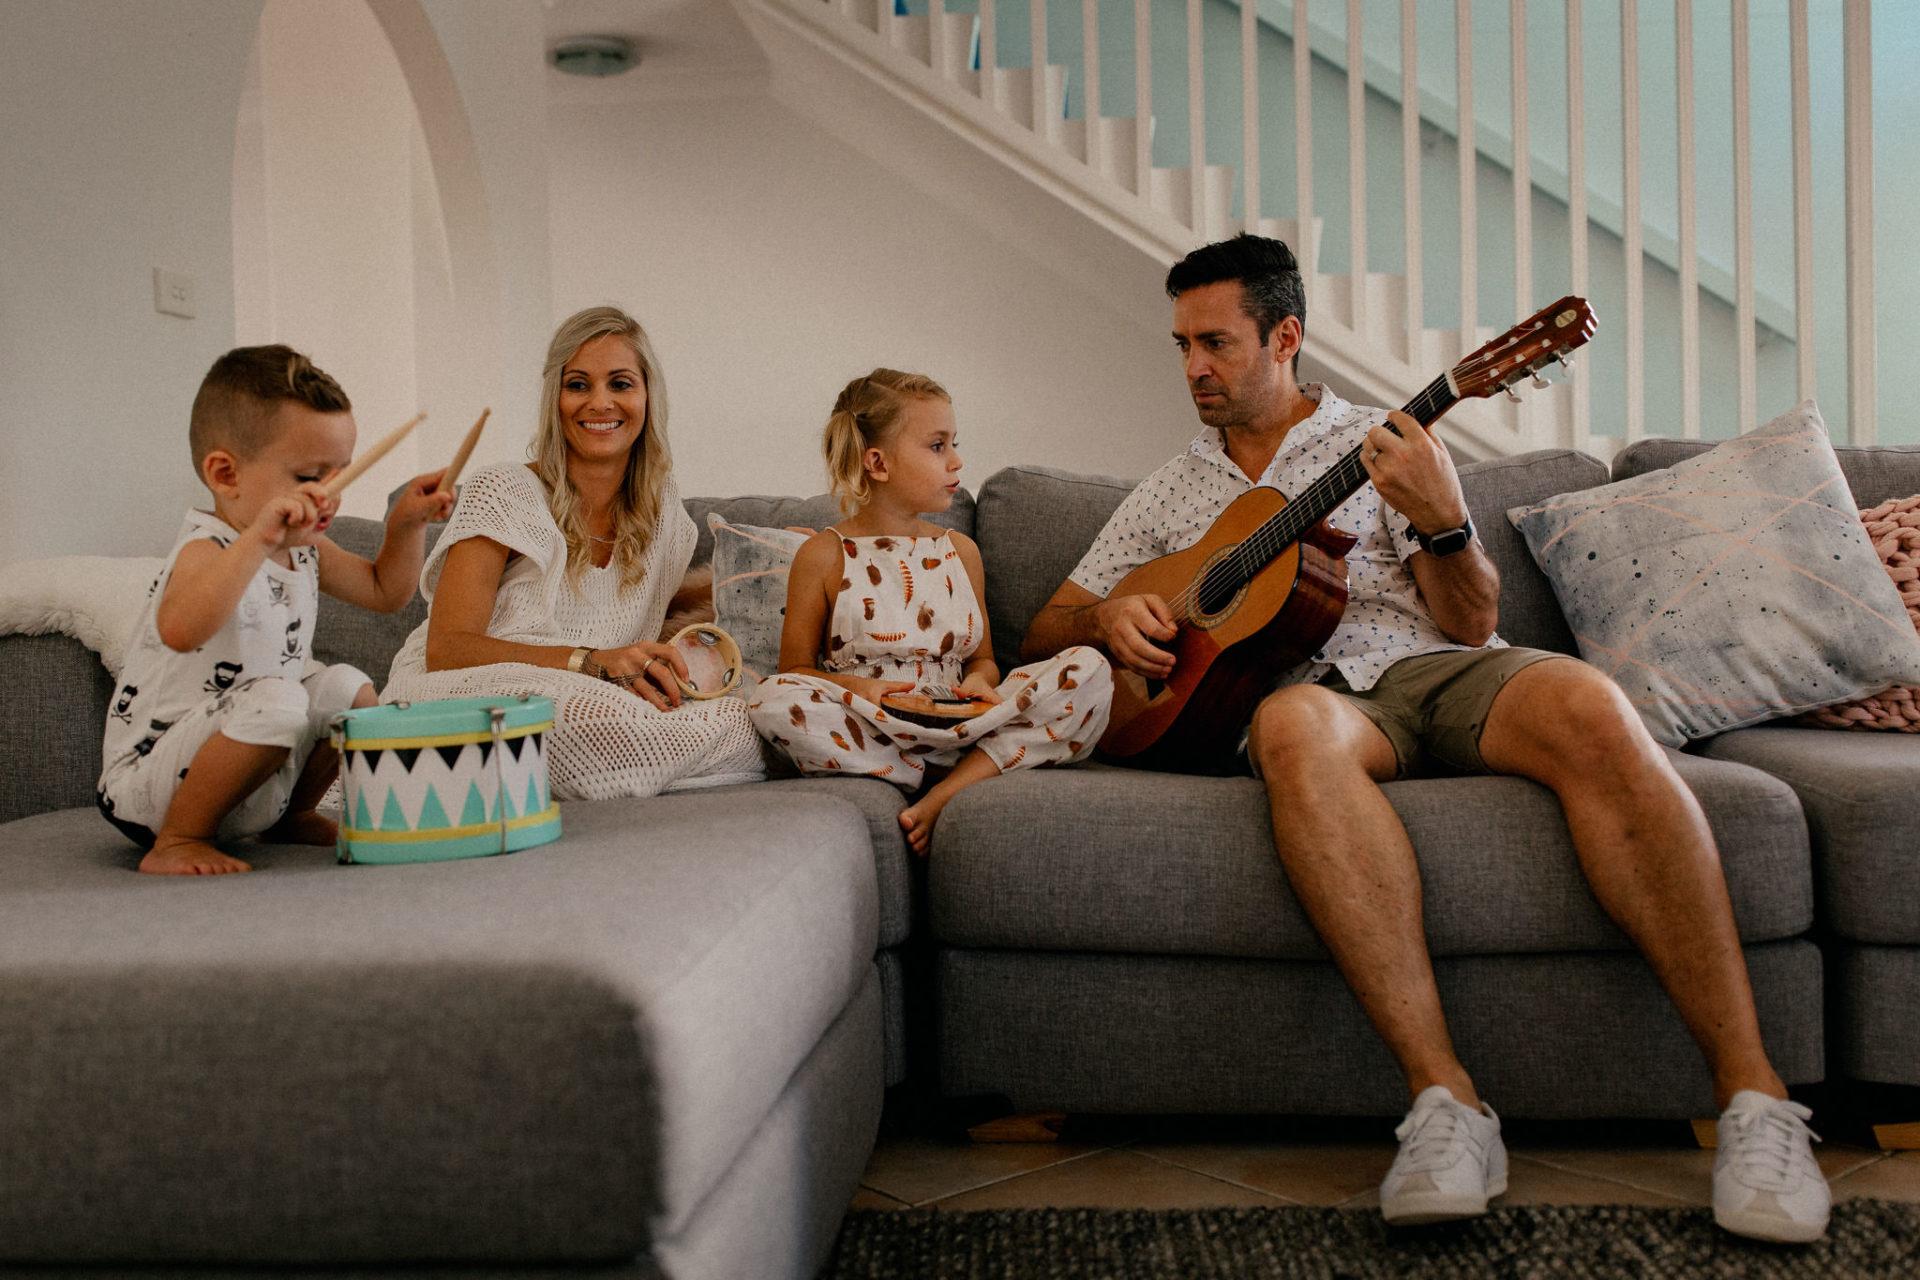 Homestory mit Kindern-Familien Fotograf Stuttgart-australien mit kindern-hippe jumpsuits für kinder-oovy fashion-sydney Familien session-bruder schwester beziehung kleinkinder